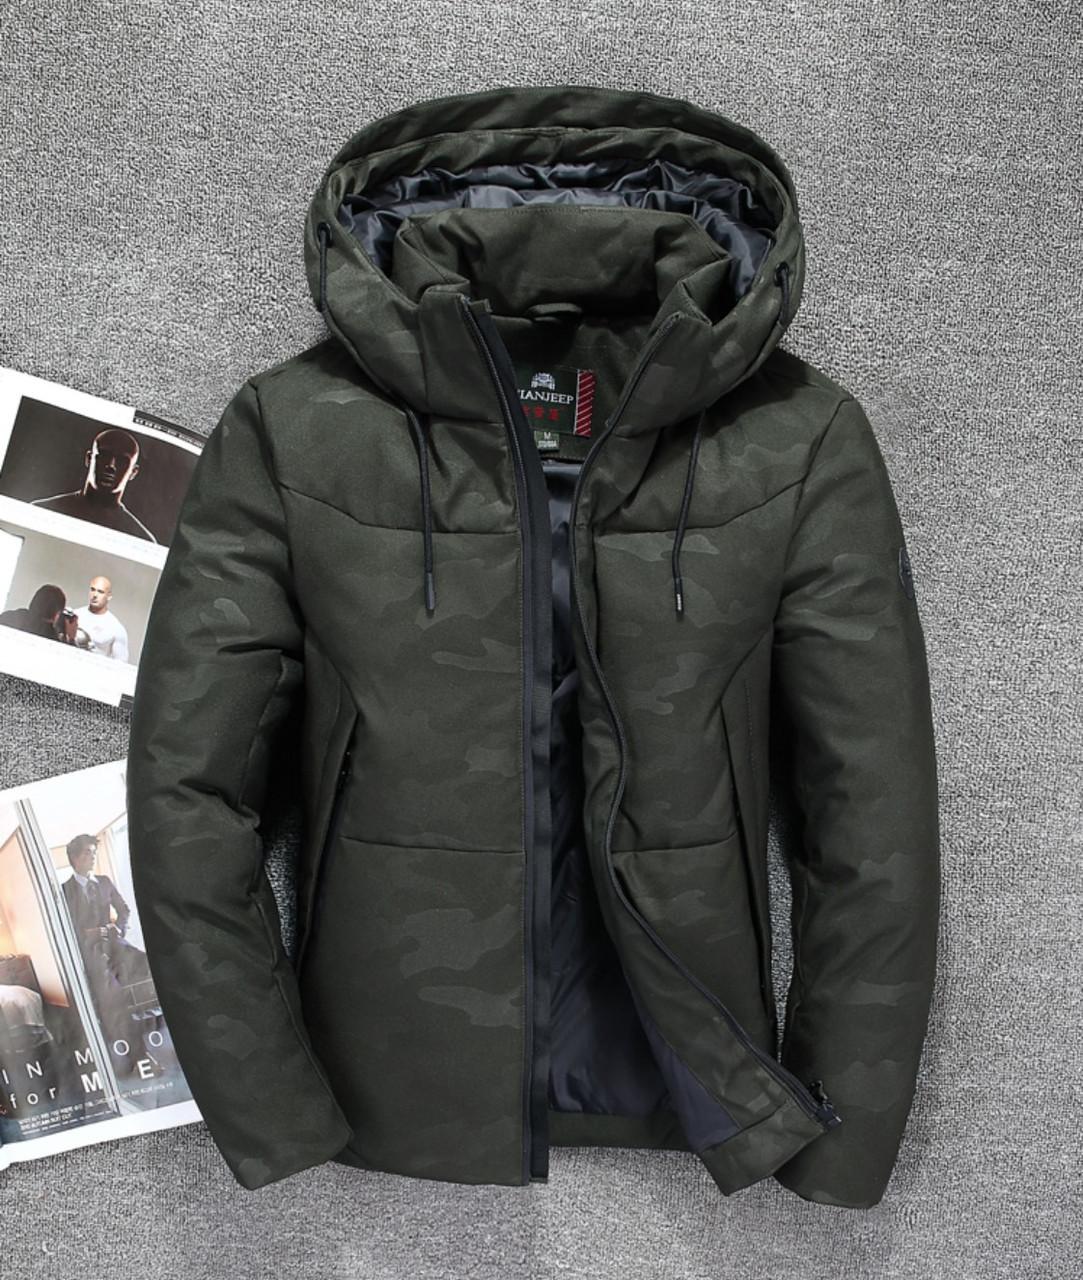 e650e18f56a Мужская Зимняя Куртка Пуховик JEEP в Наличии! (JP-CAMO 02)